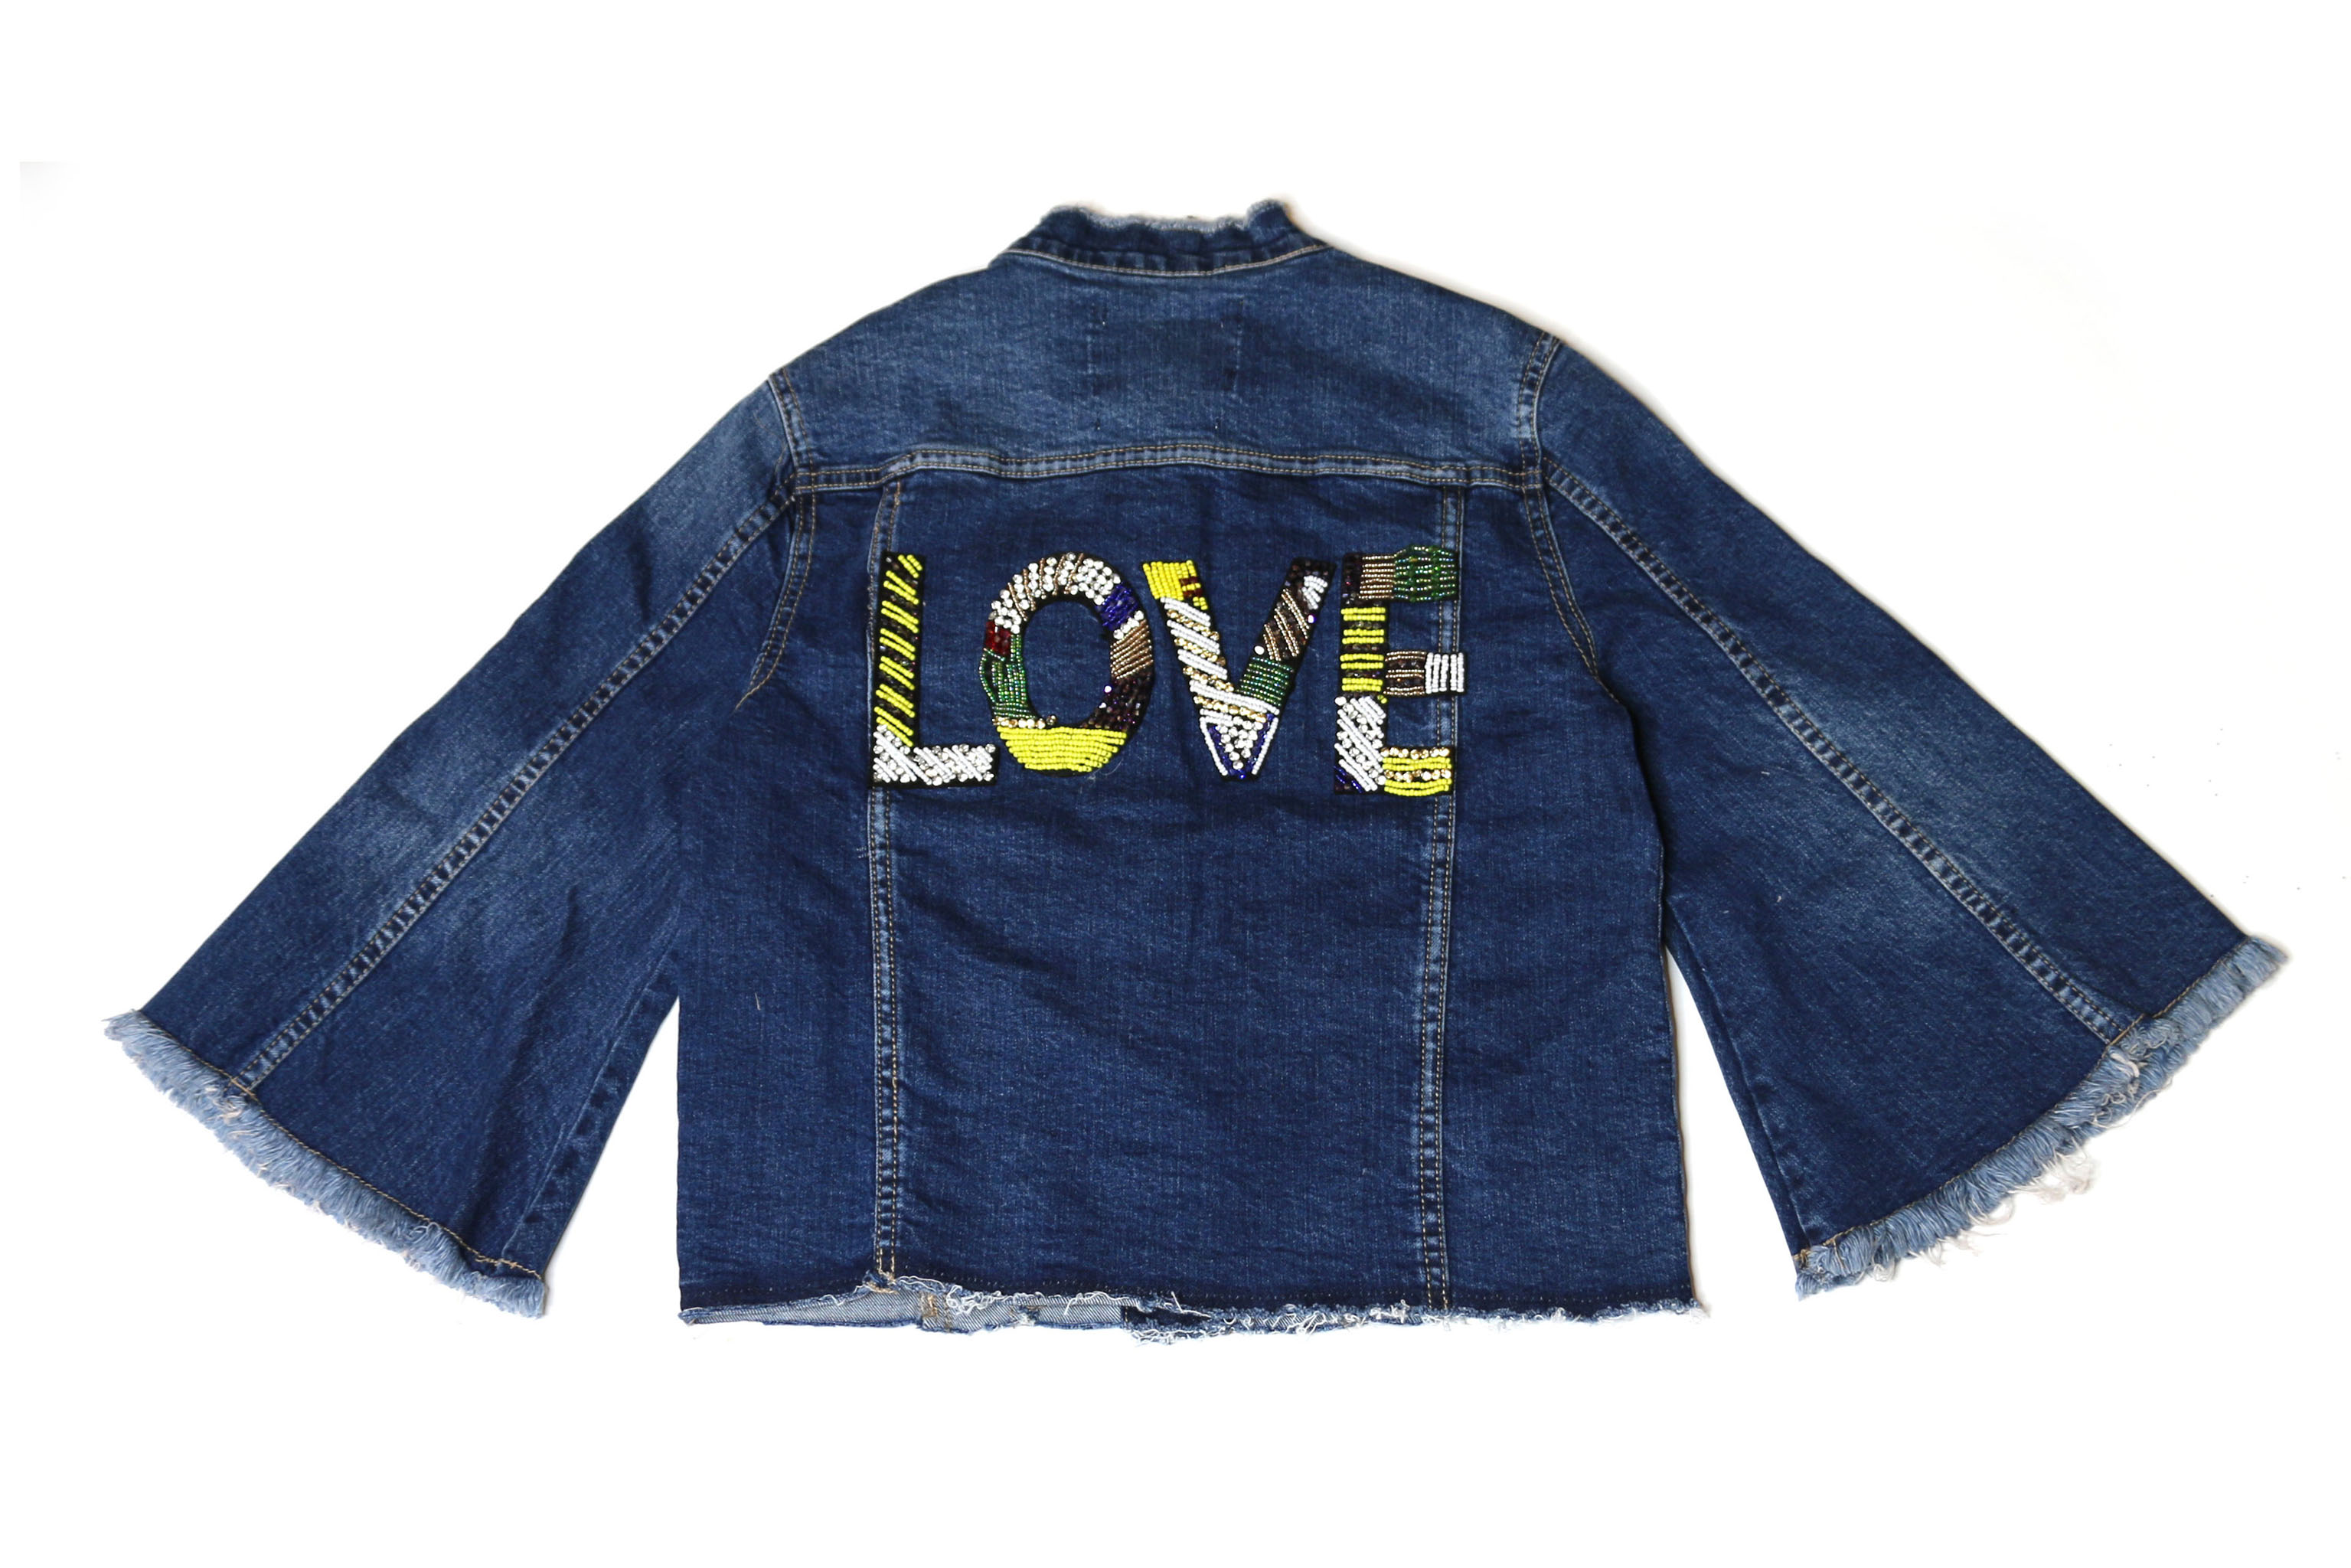 A style from Rachel Roy's mini LOVE capsule.